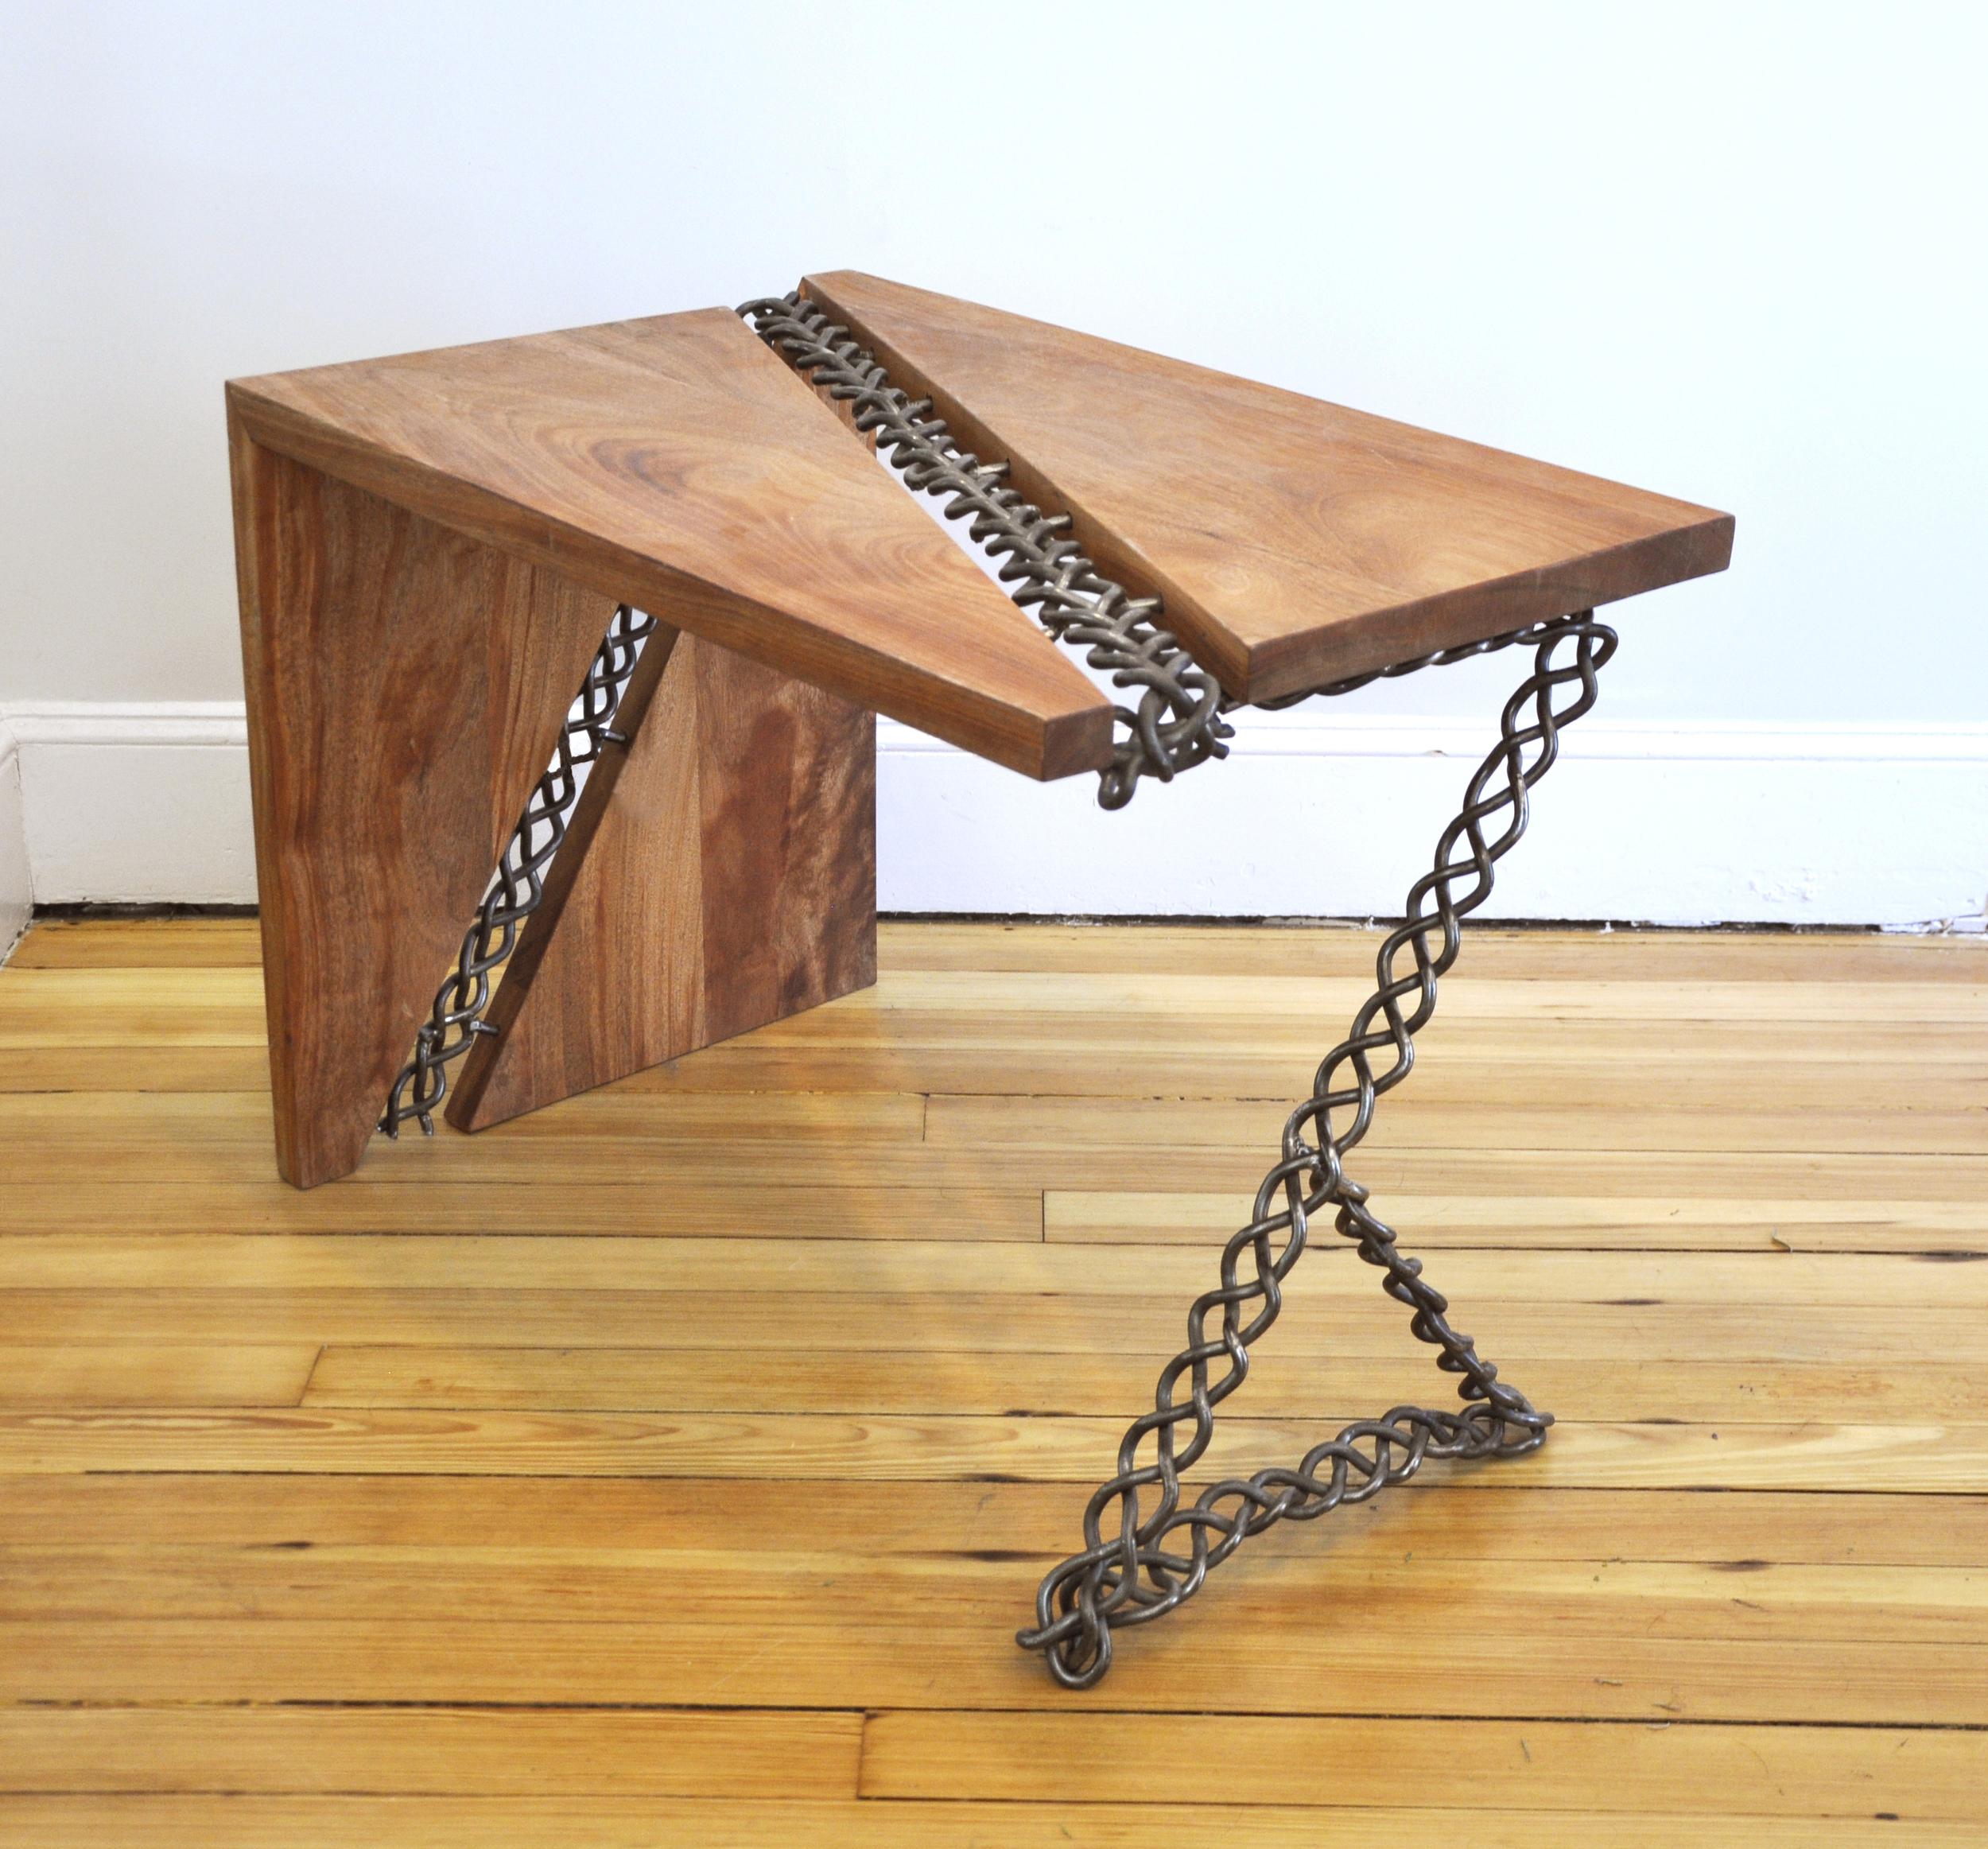 BRAIDED+TABLE3-MCKENZIE+GIBSON.jpg